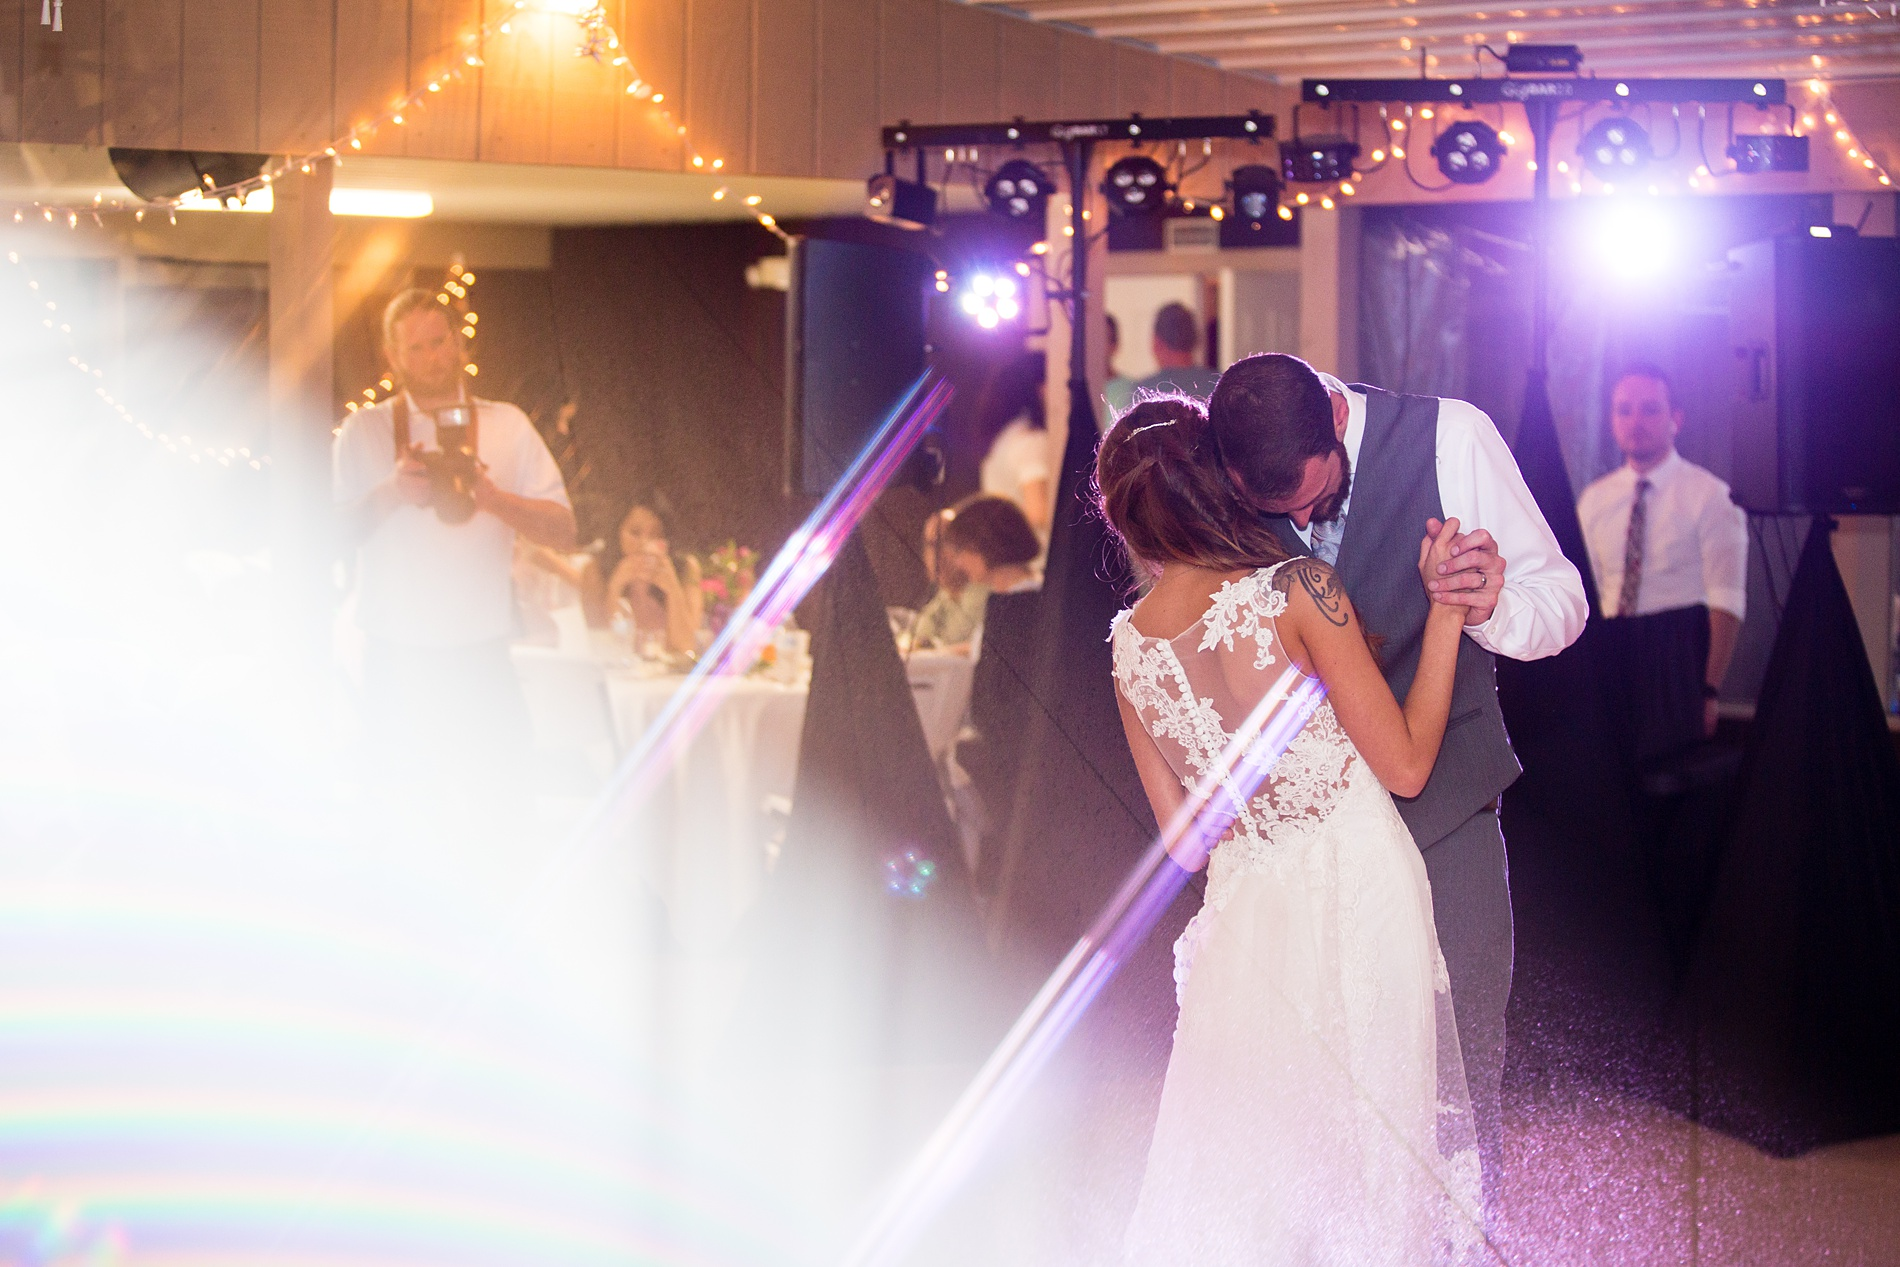 Brandon_Shafer_Photography_Brett_Autumn_Wedding_0058.jpg